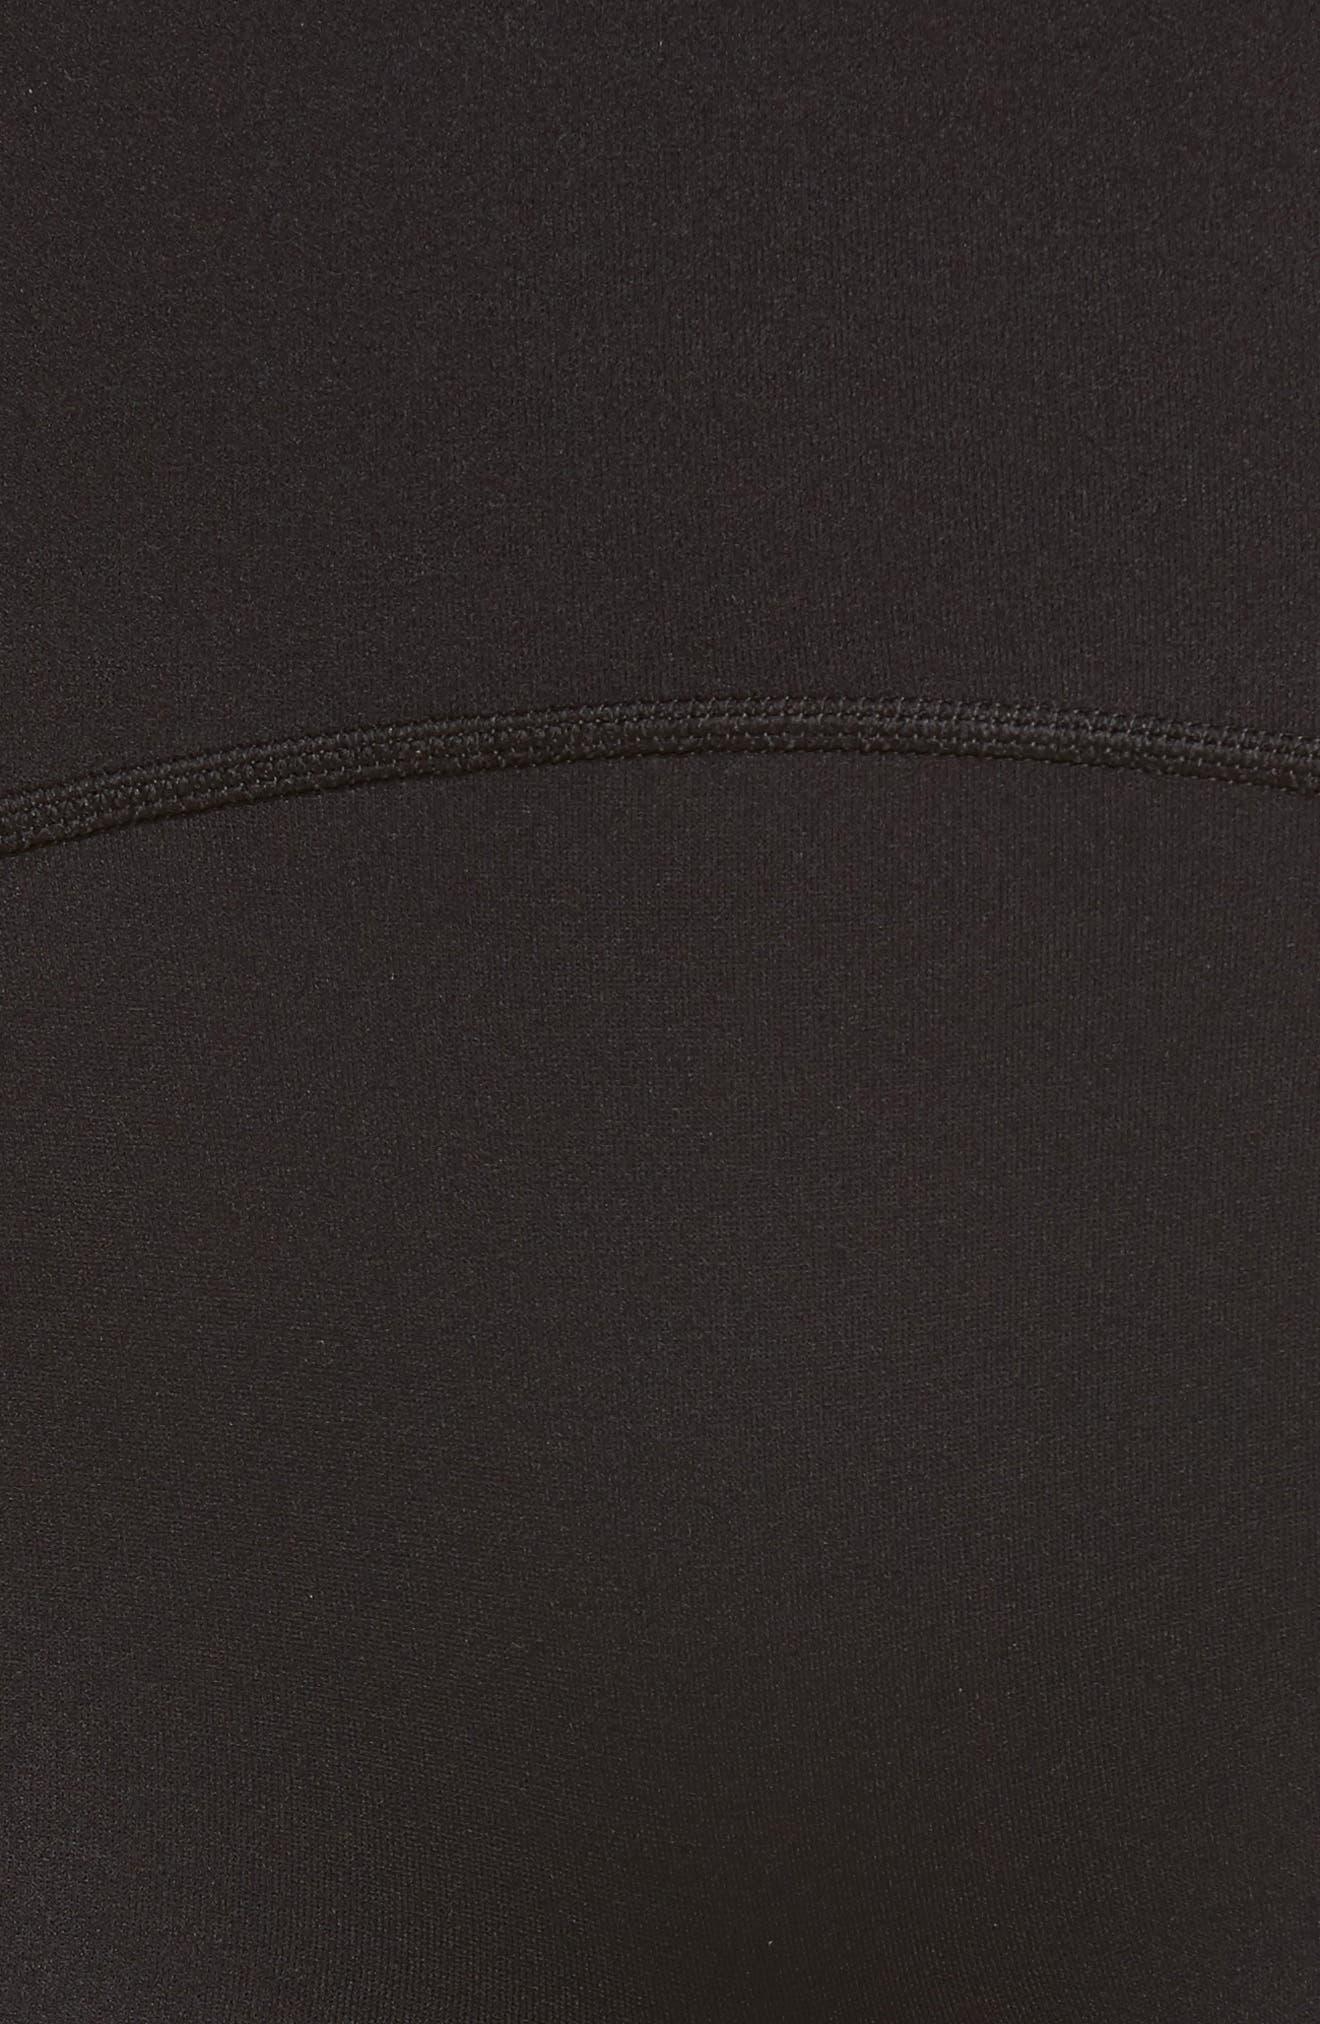 Sport Compression Shorts,                             Alternate thumbnail 5, color,                             BLACK